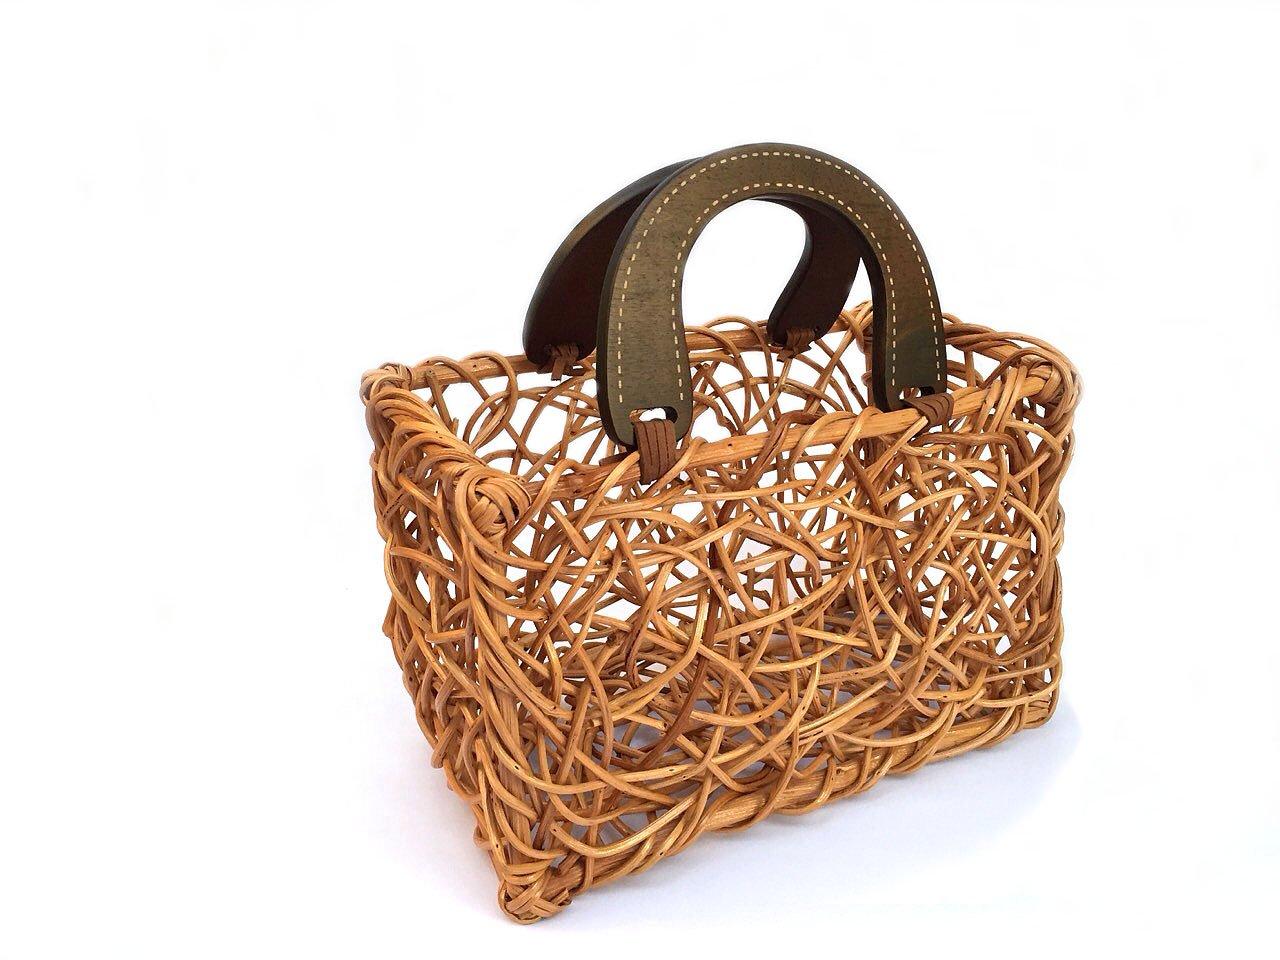 Picnic Basket Flower Girl Basket Beach Picnic Basket Willow Basket Wicker Basket Storage Basket